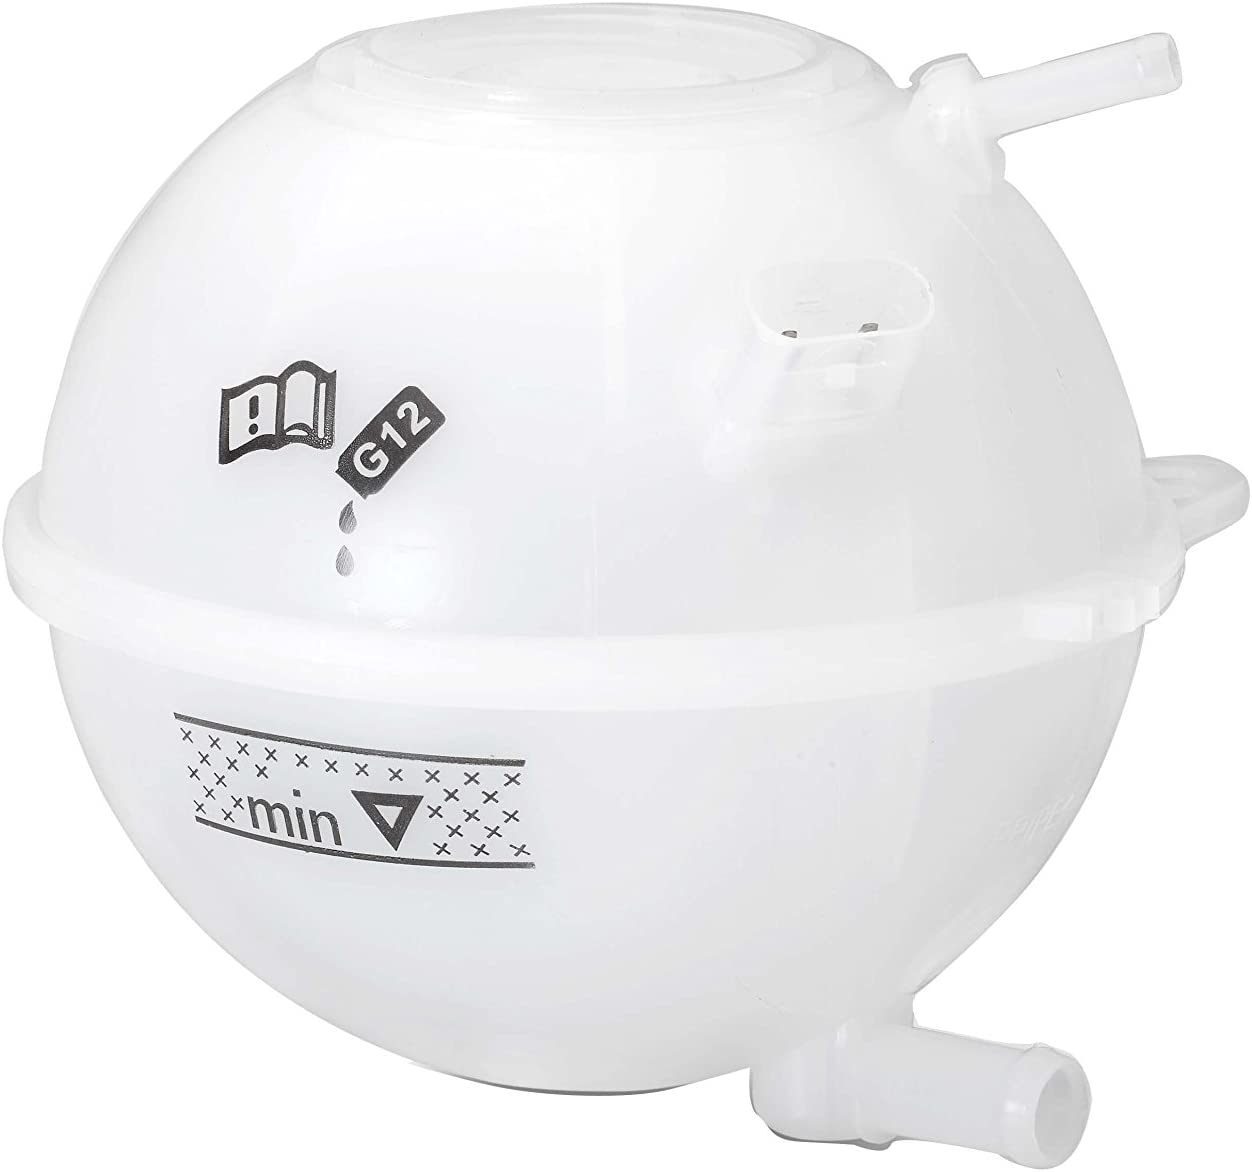 BEHR HELLA SERVICE 8MA 376 755-041  Expansion Tank coolant